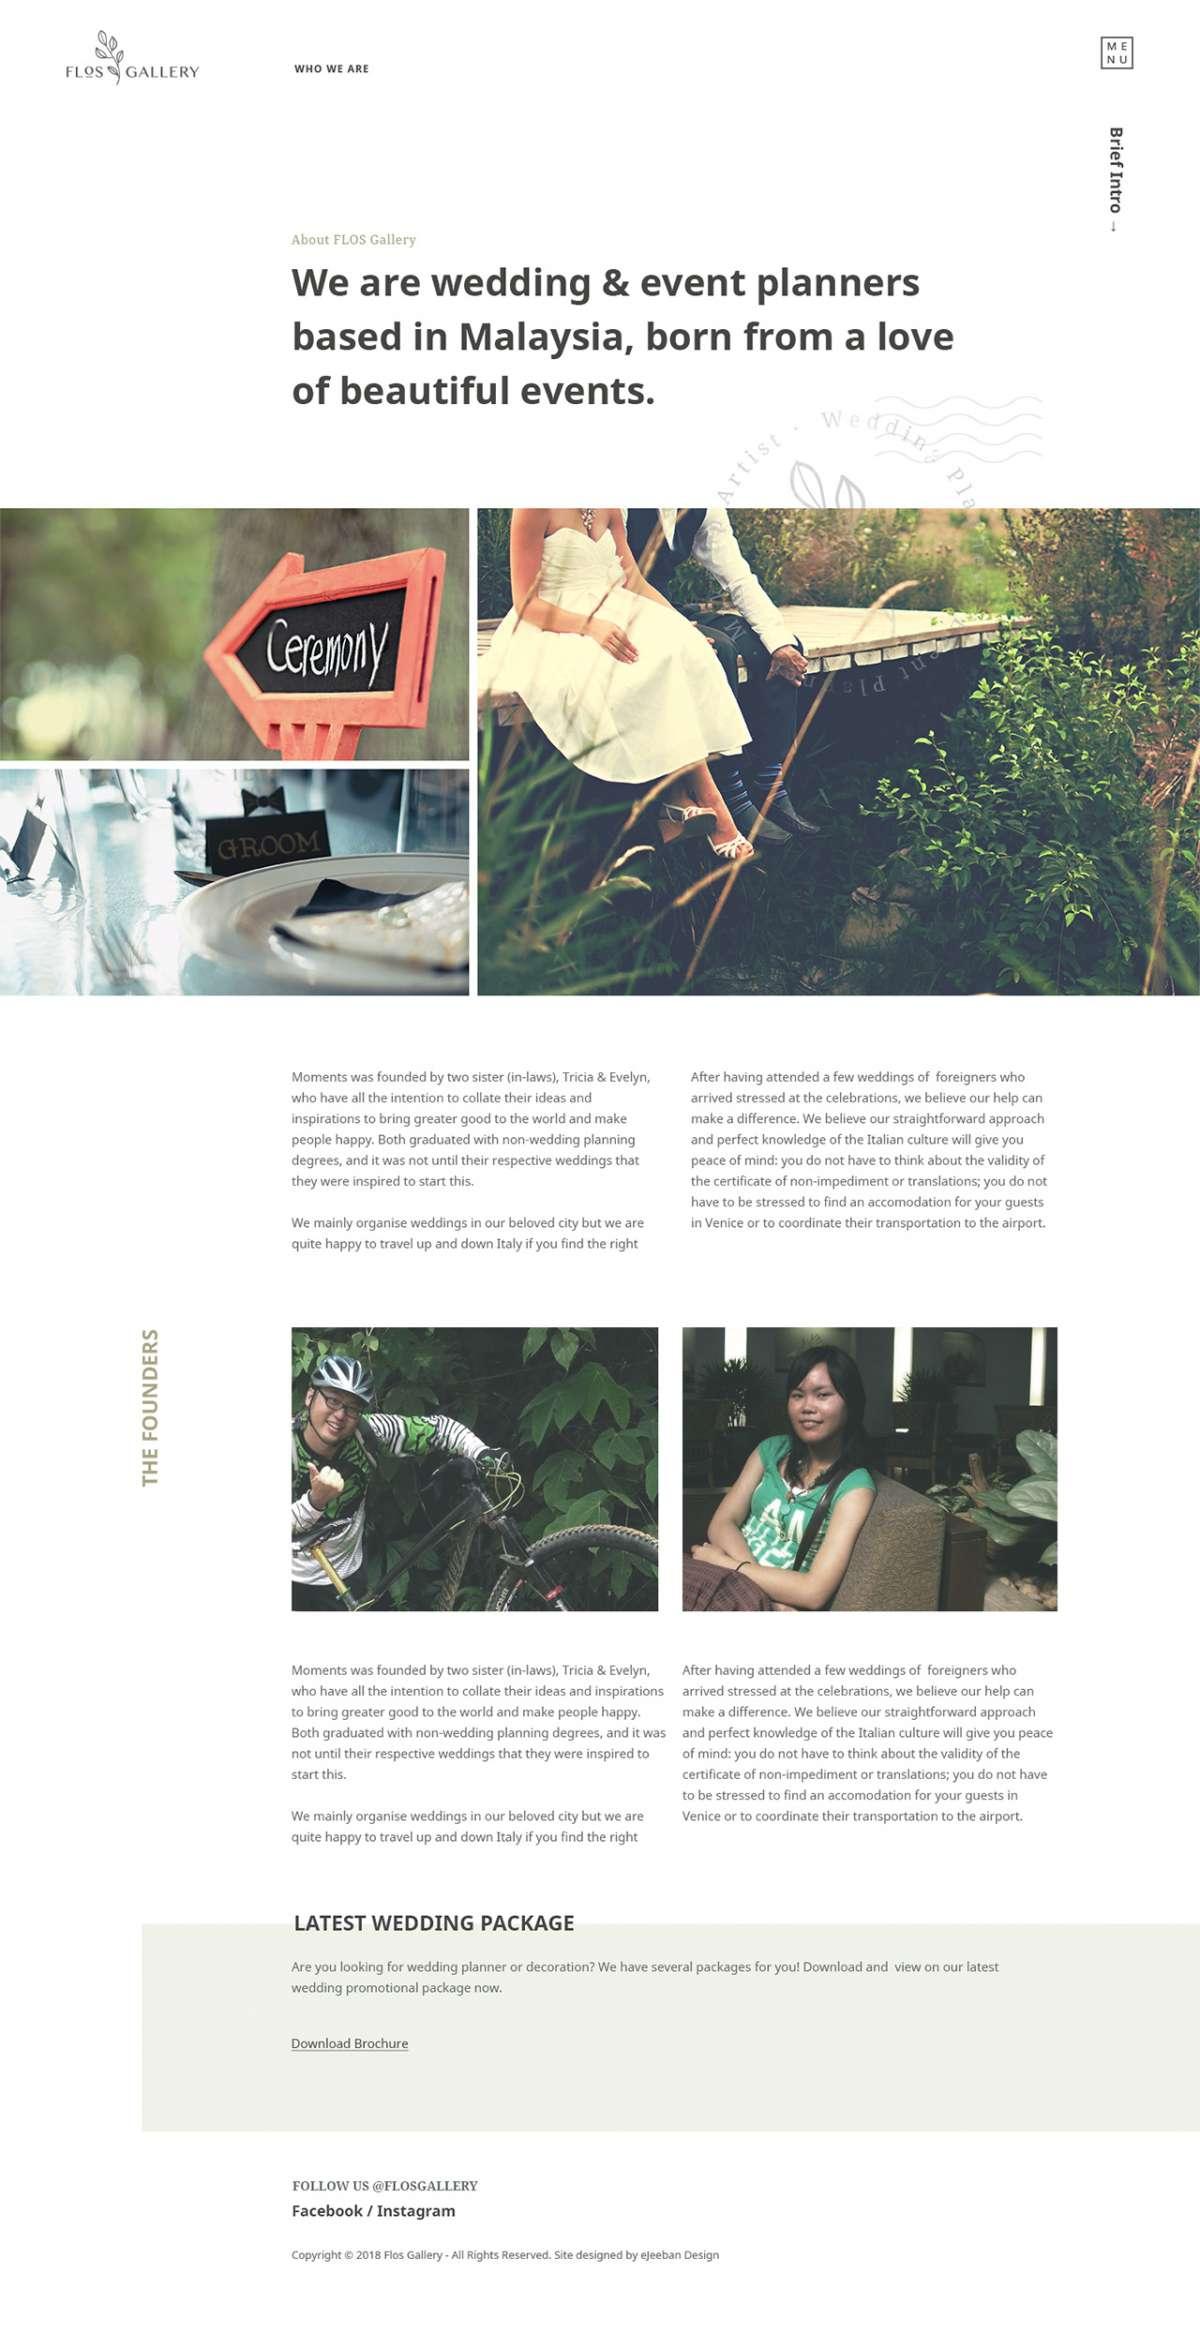 Web Design Malaysia | Web Design | Web Design Portfolio - Flos Gallery